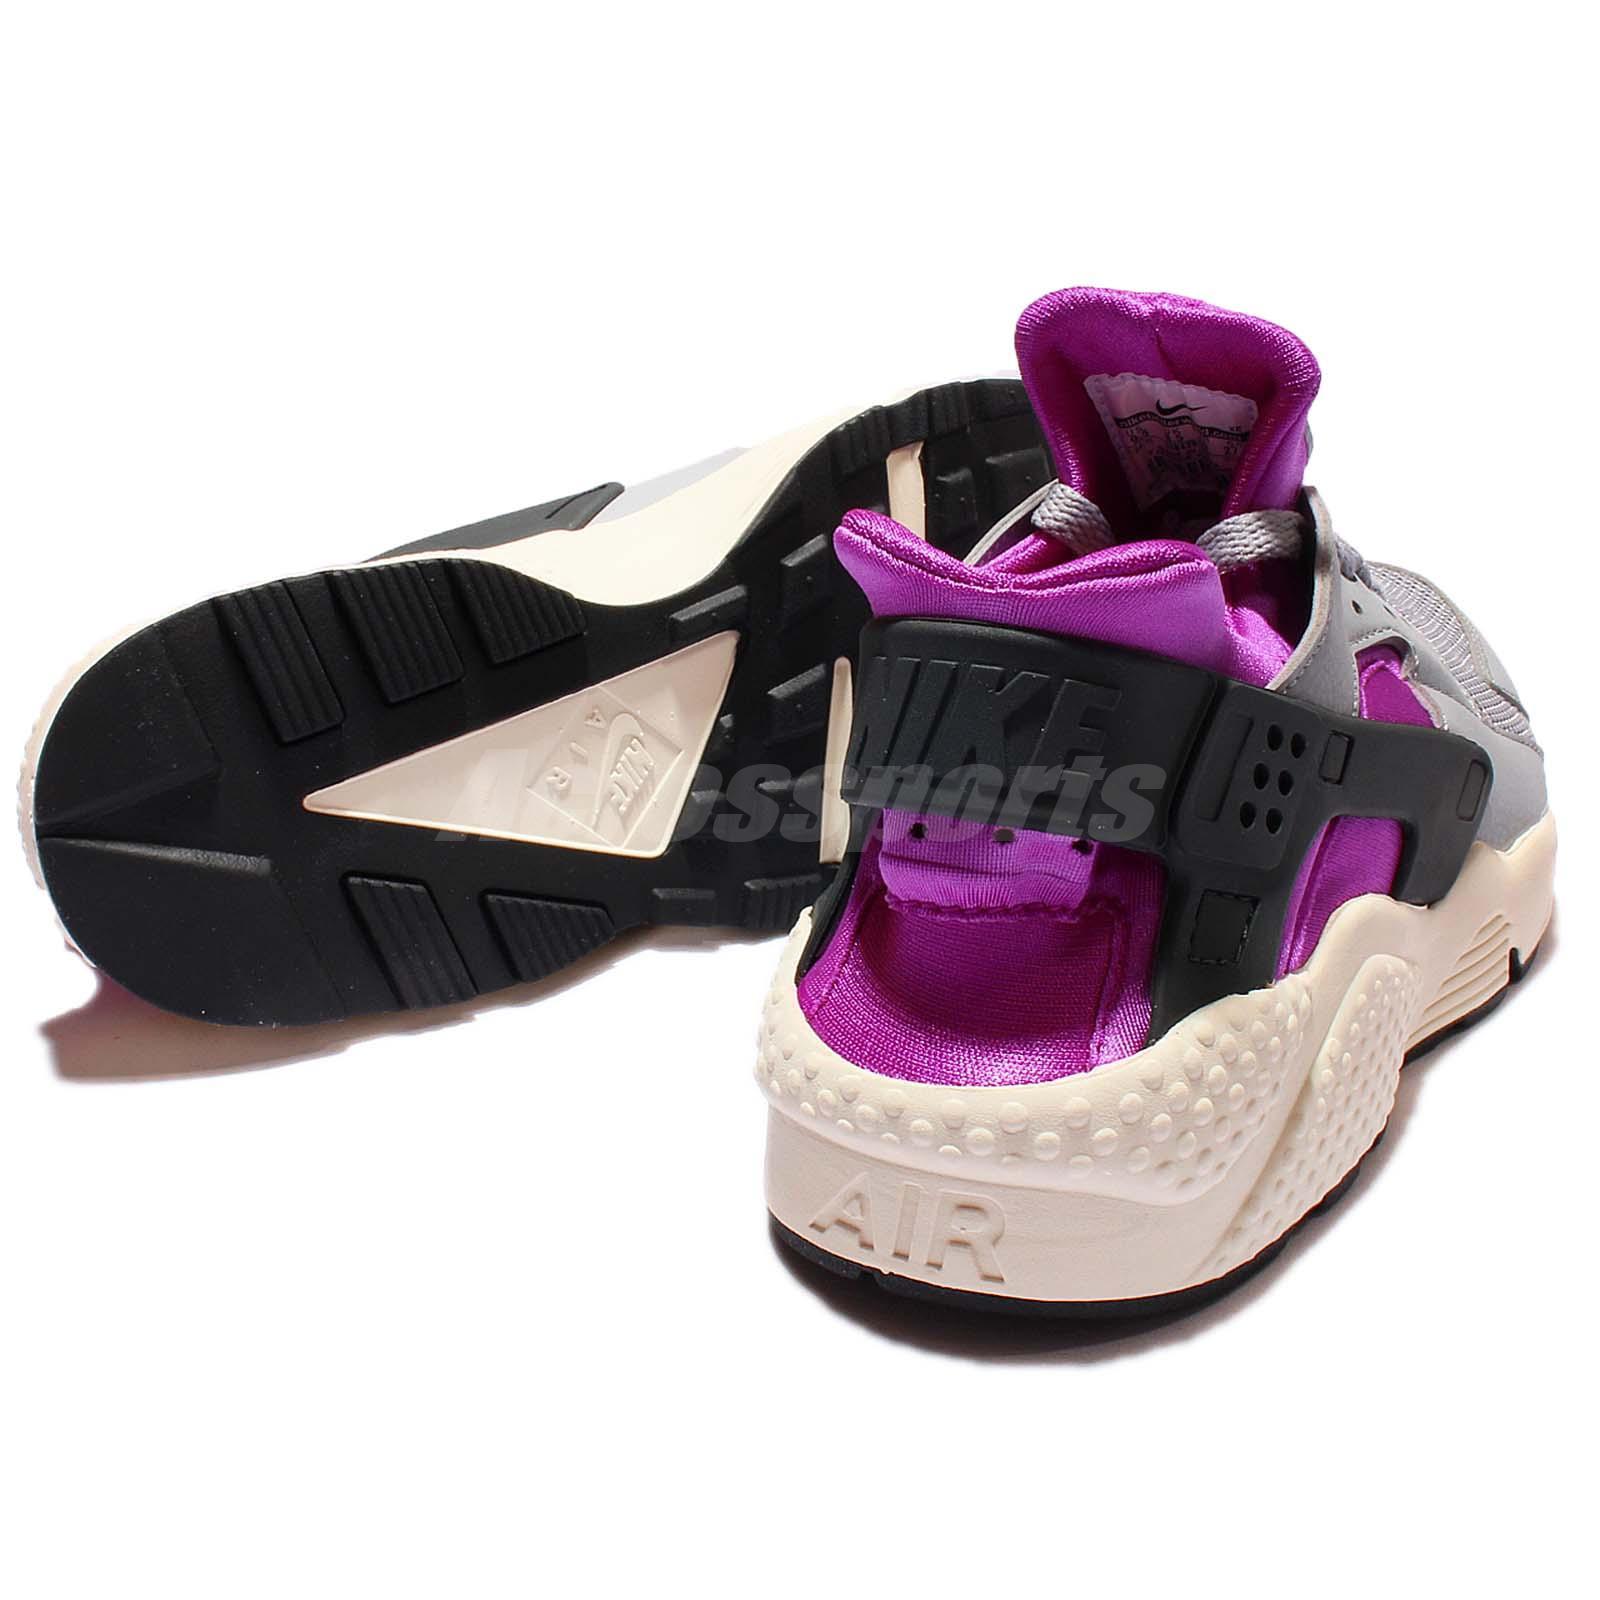 Nike Air Huarache Grey Sail Purple Mens Running Trainer Sneakers Shoe 318429-502 8rzPcEL